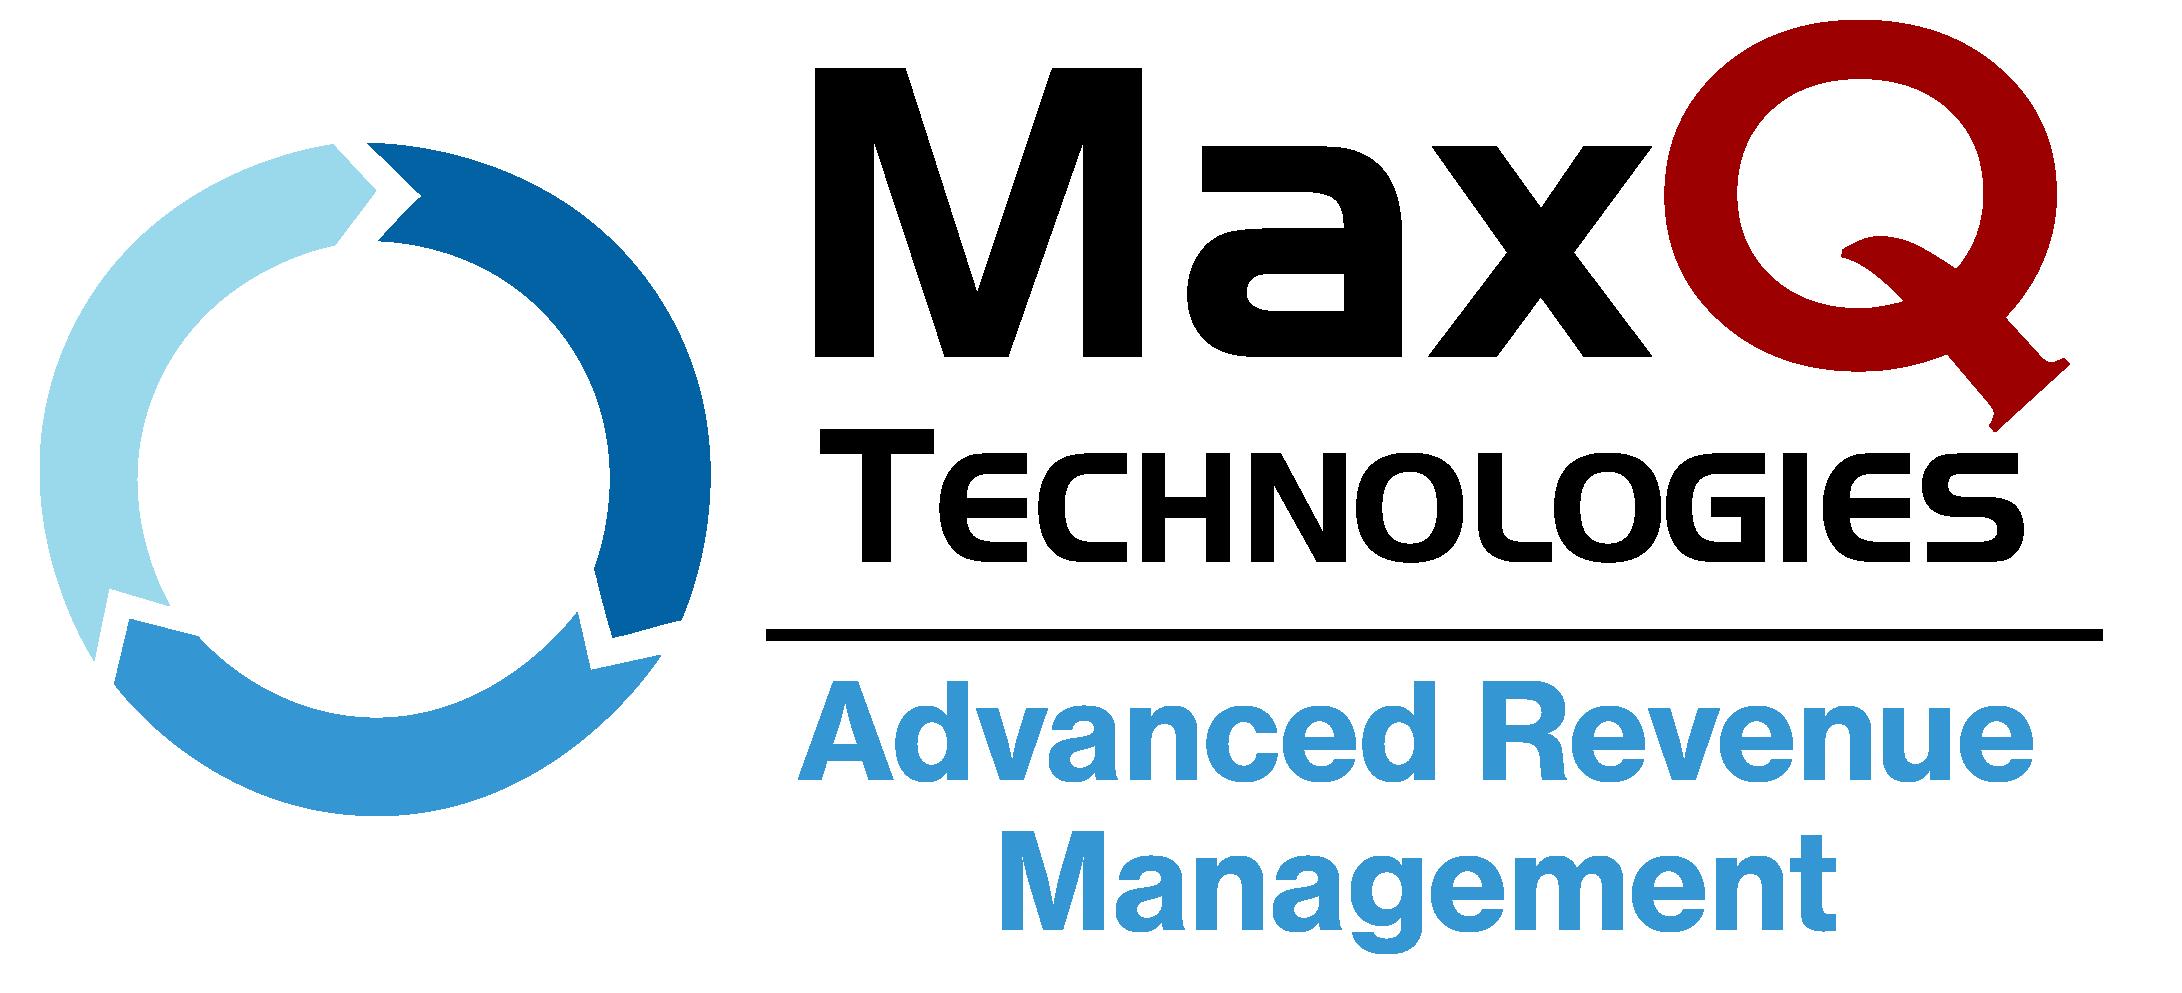 MaxQ Technologies Advanced Revenue Management logo.